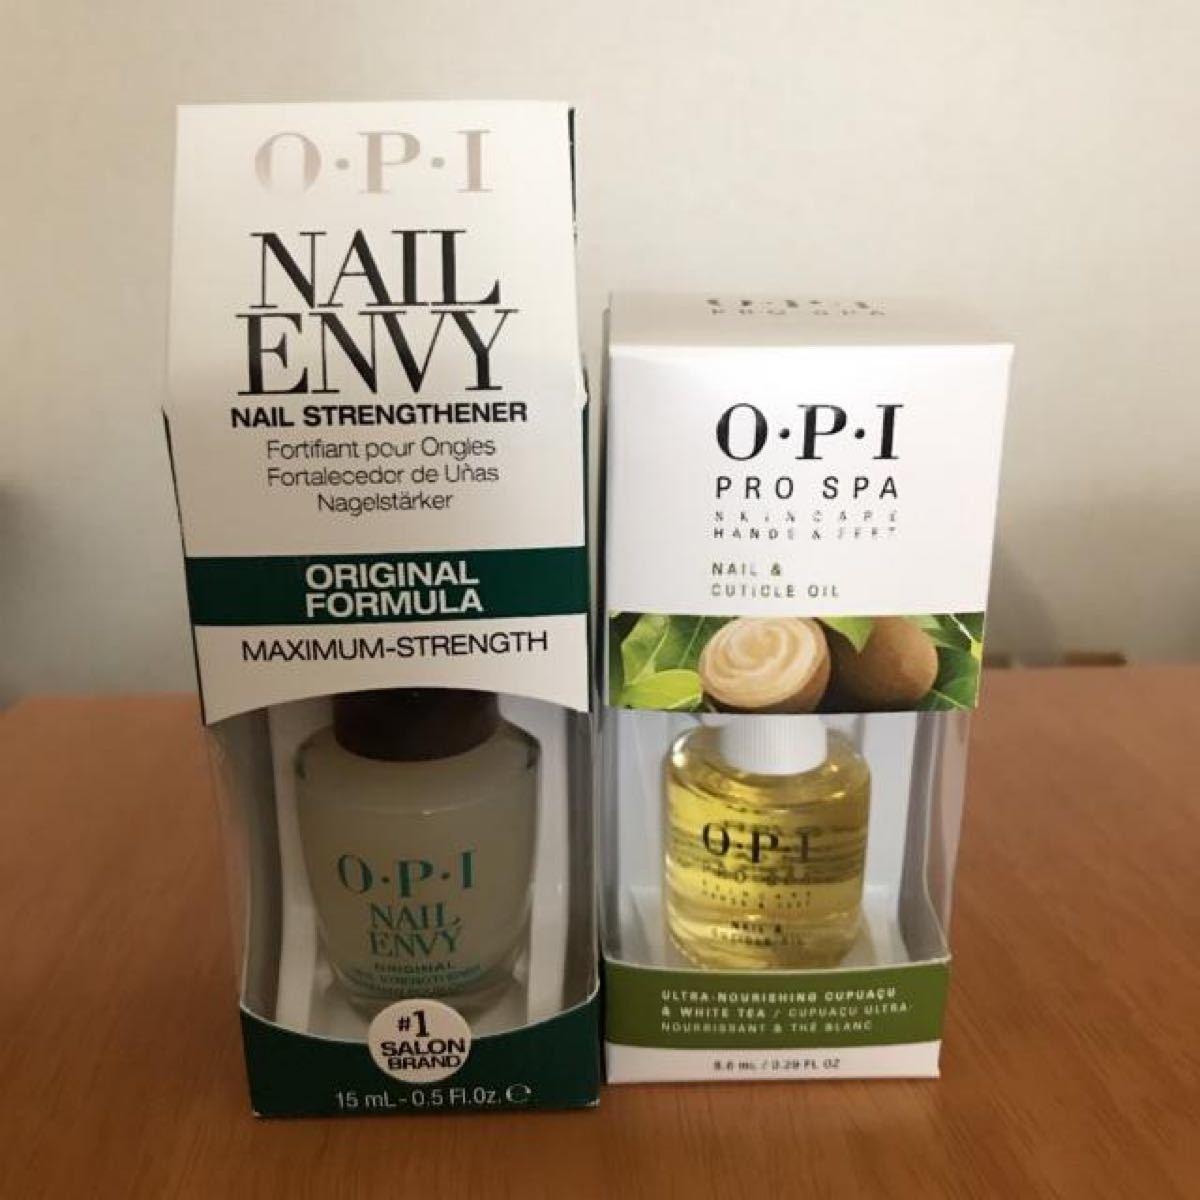 OPI  ネイルエンビー&キューティクルオイル 2個セット ☆新品☆